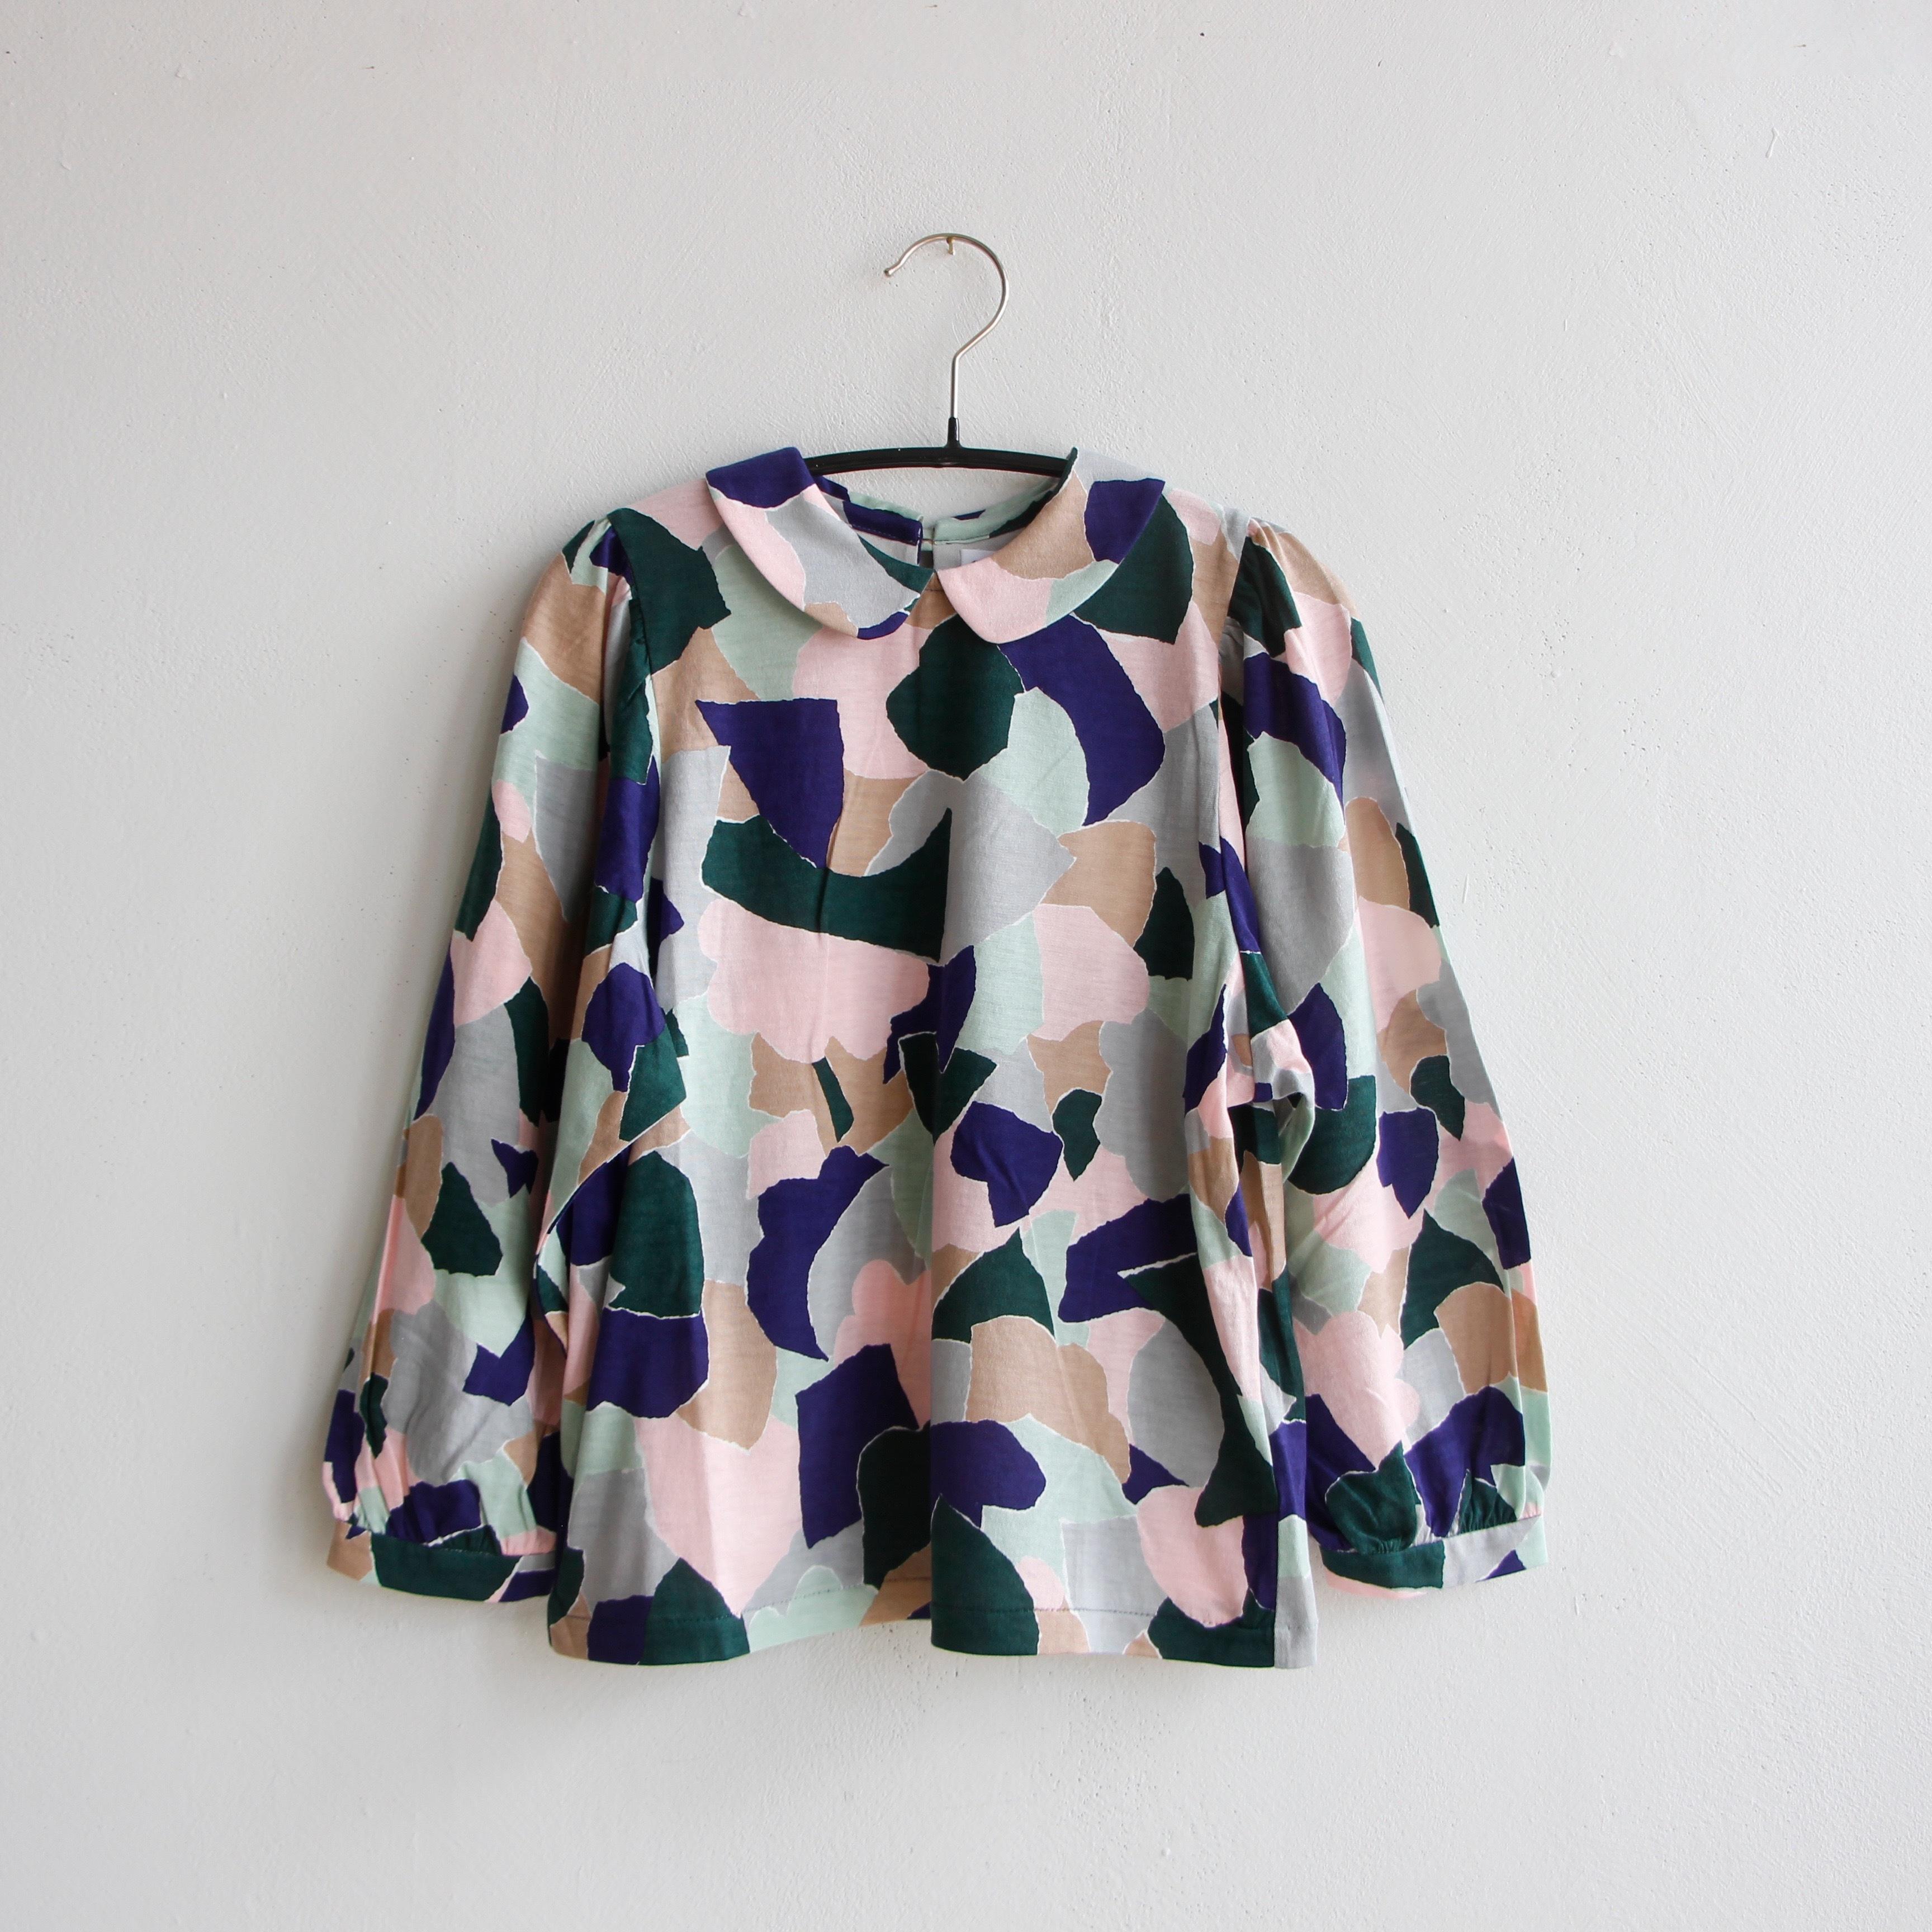 《mina perhonen 2020AW》foliage 長袖カットソー / pink mix / 110-140cm